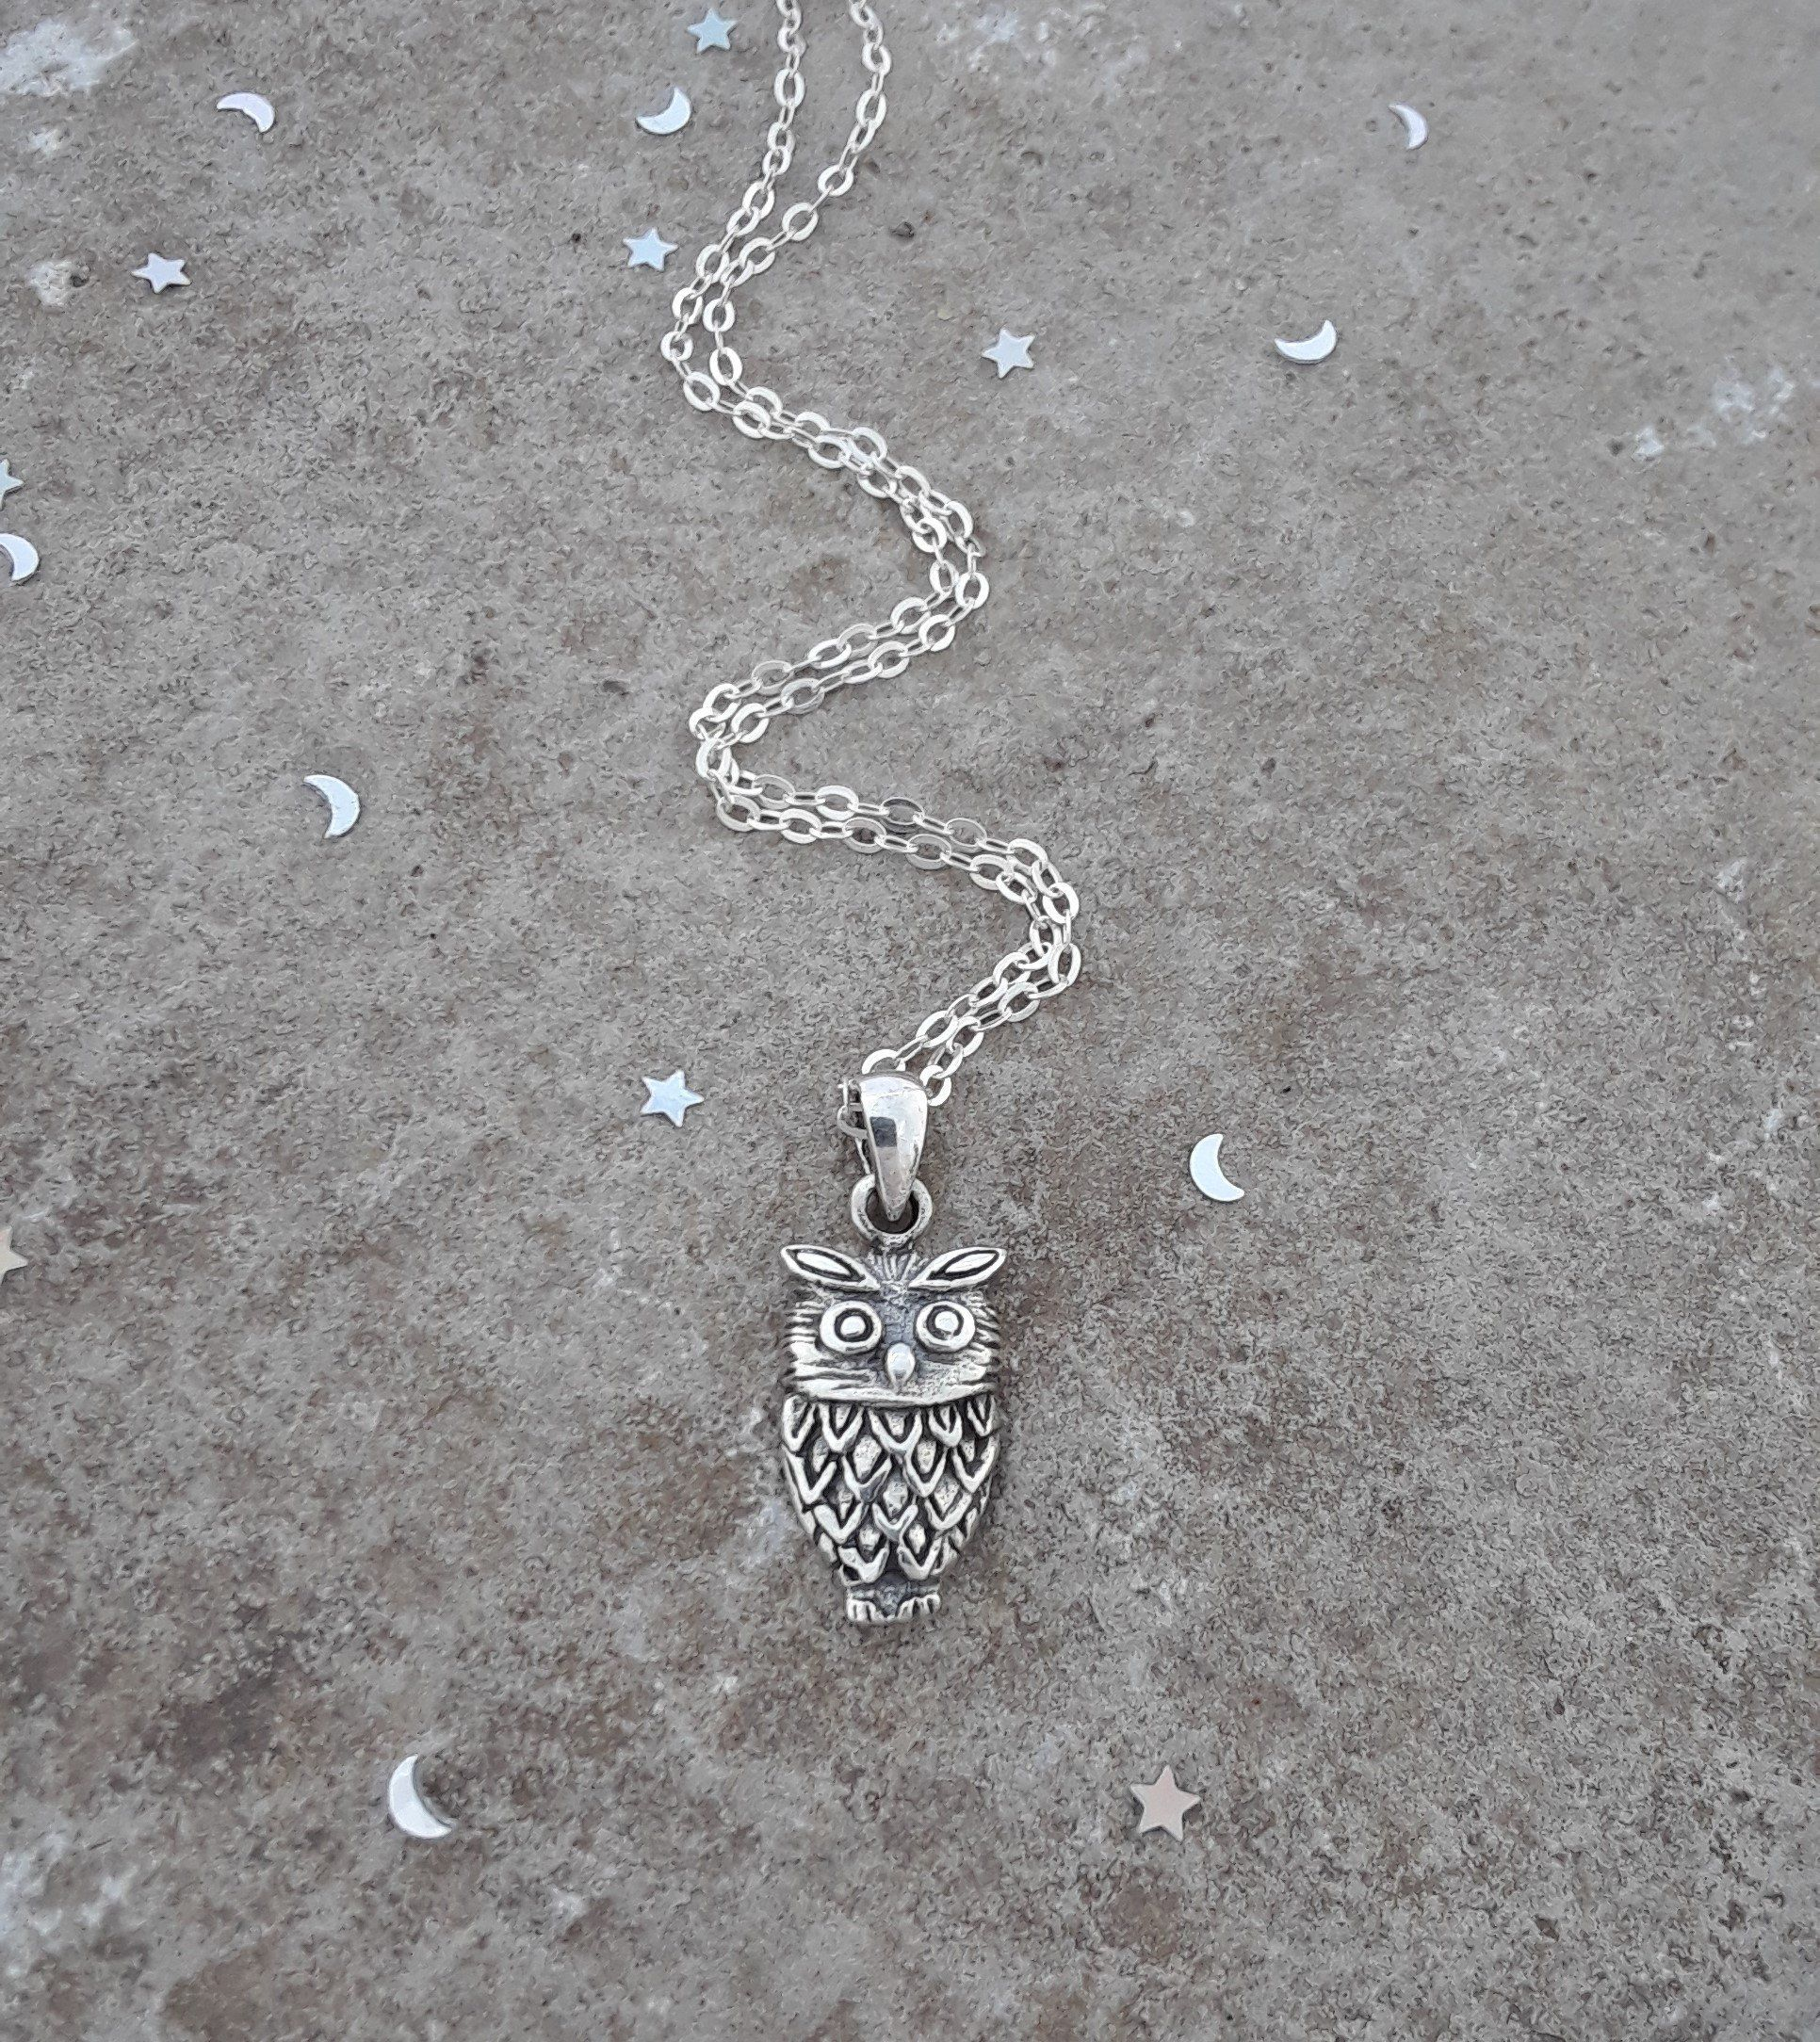 100Pcs Tibetan Style Alloy Spike Beads Charm Necklace Bracelet Pendant Jewelry